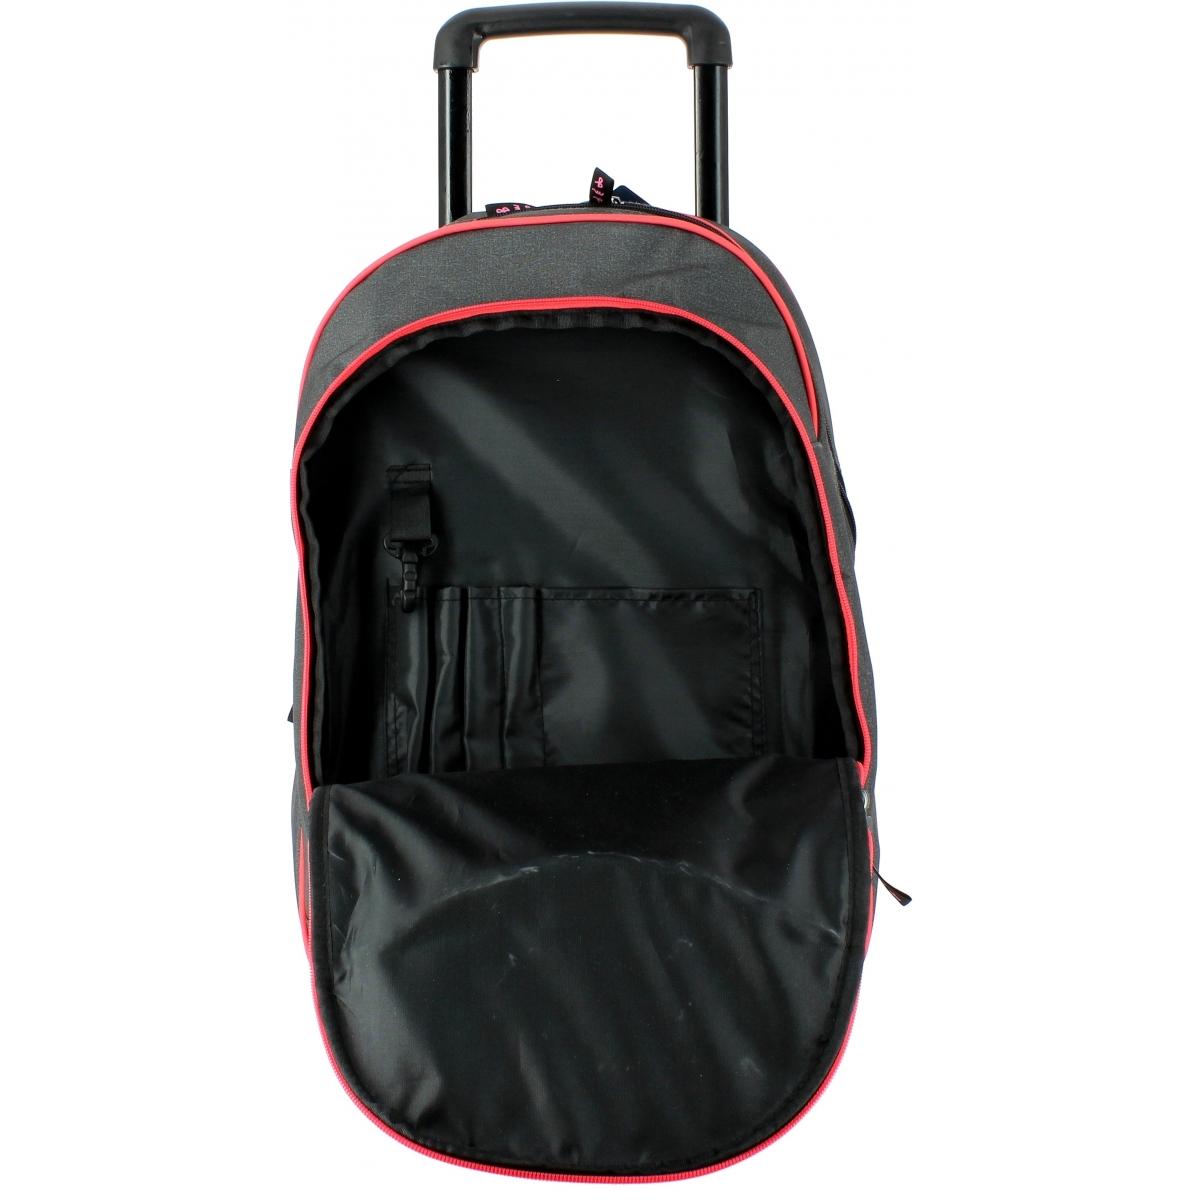 sac dos double roulettes school pack 76037 couleur principale assortis promotion. Black Bedroom Furniture Sets. Home Design Ideas